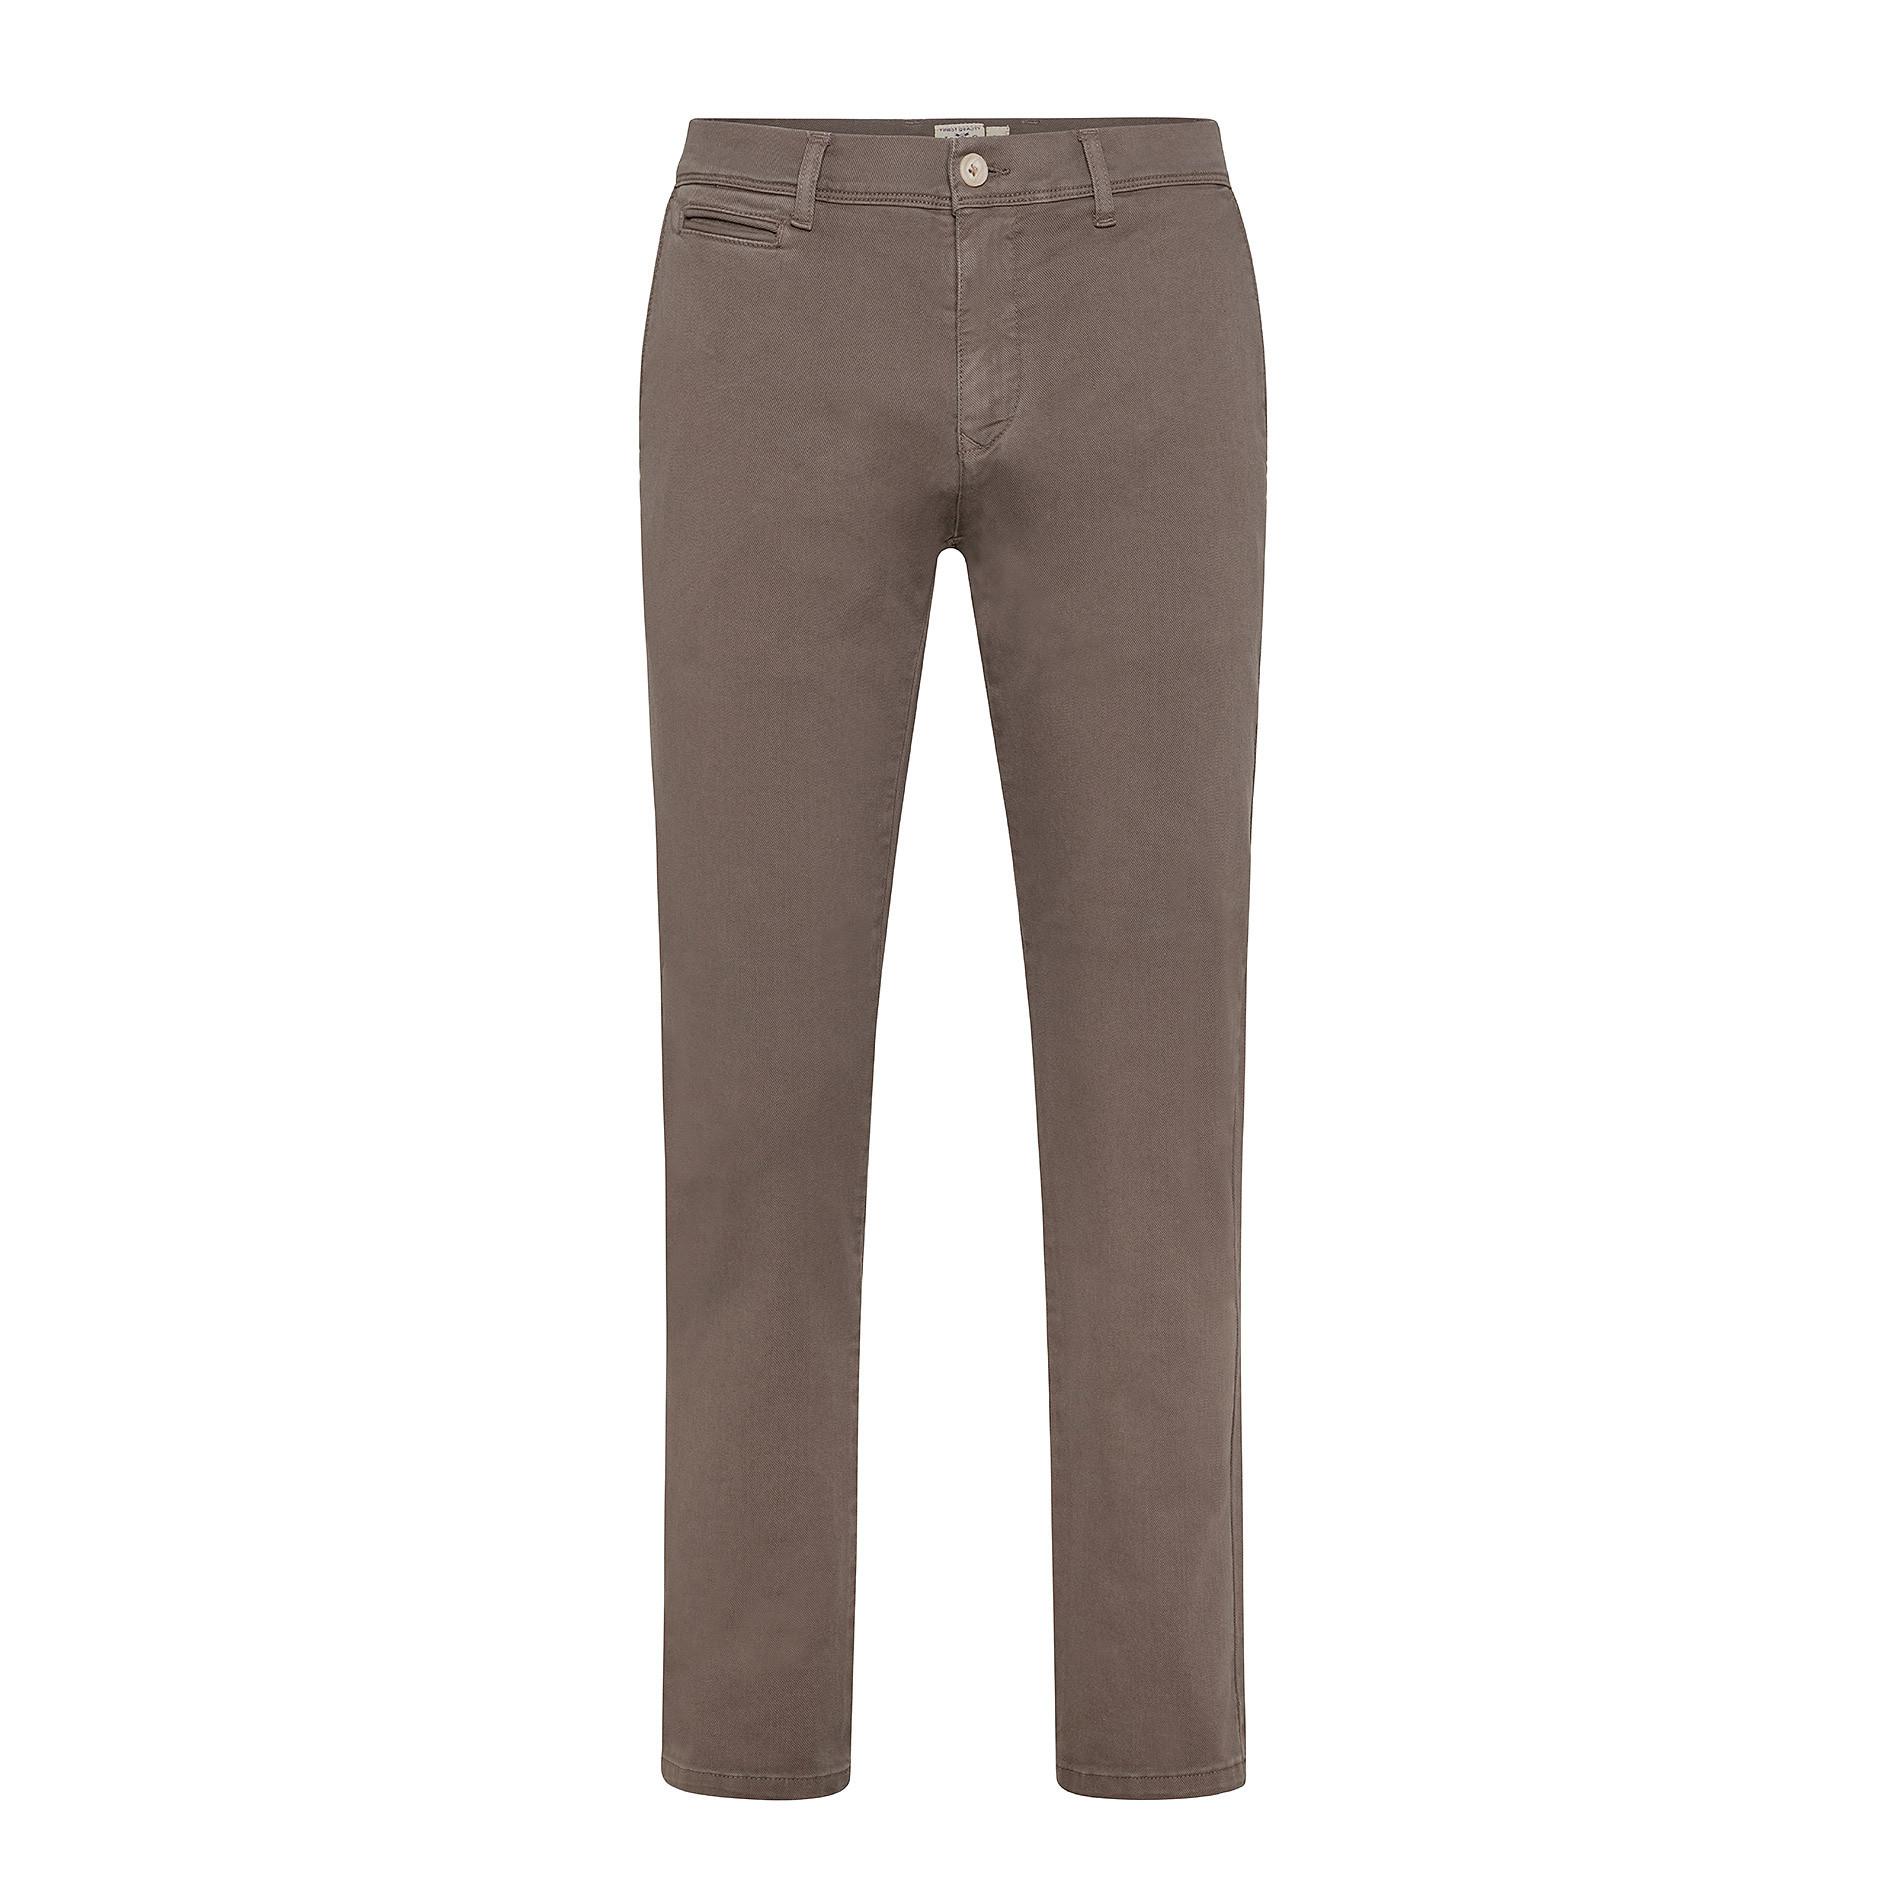 Pantalone chino gabardina stretch JCT, Beige, large image number 0